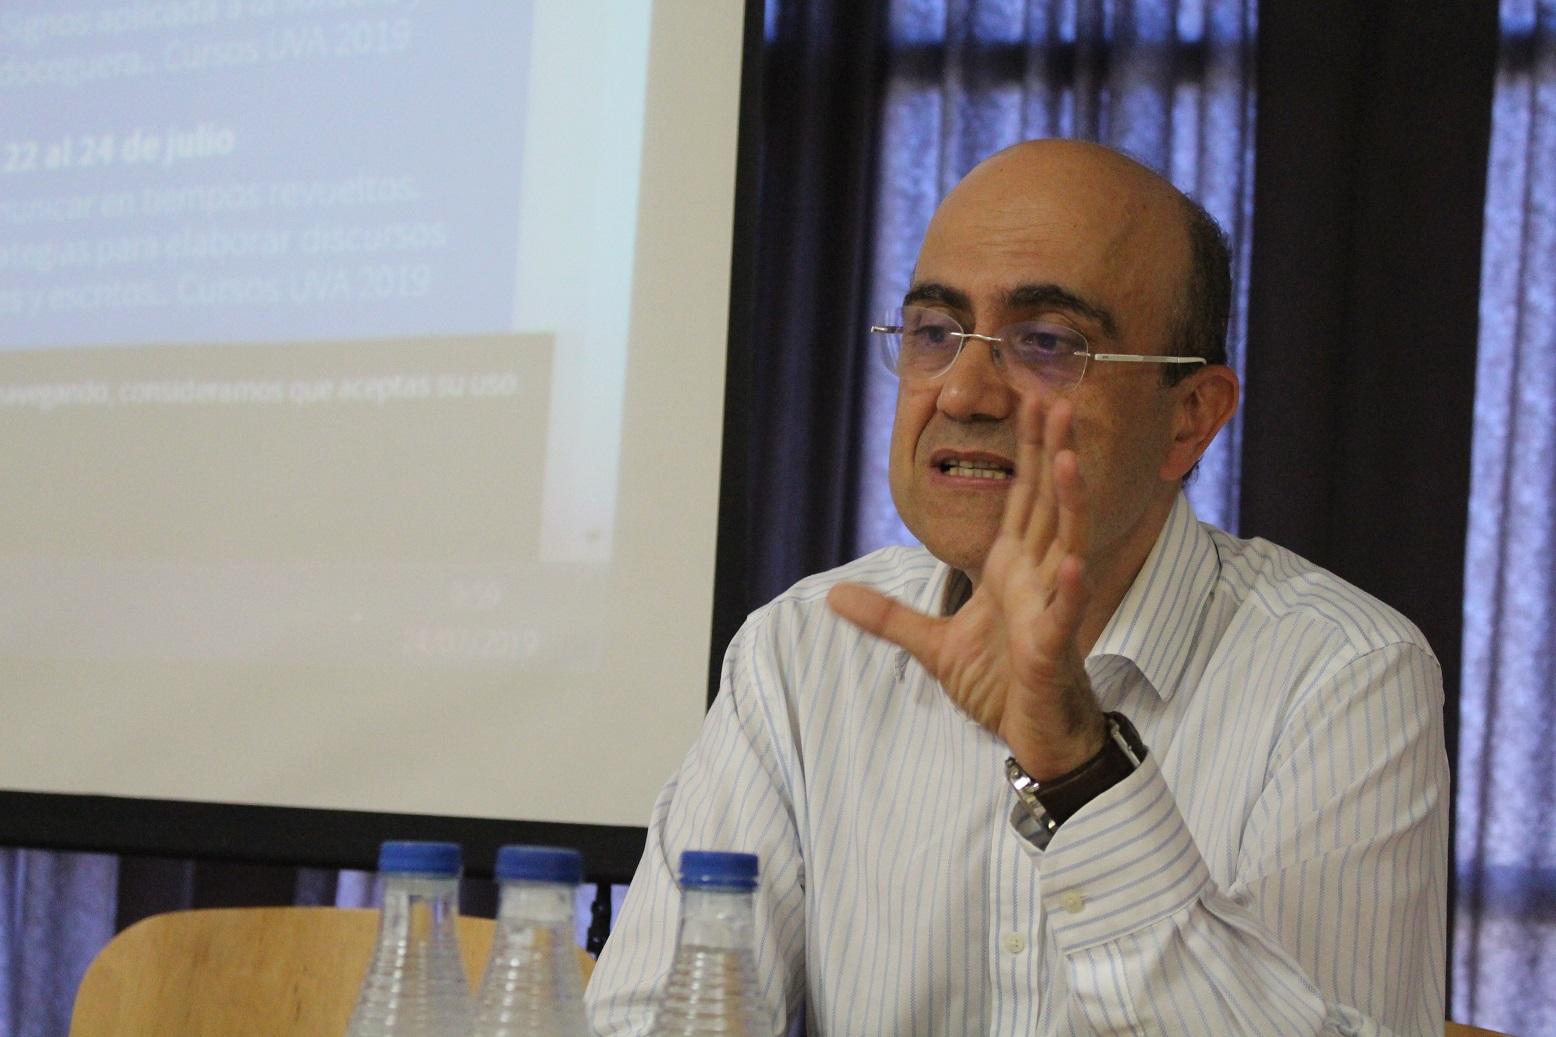 José Fernando Lousada